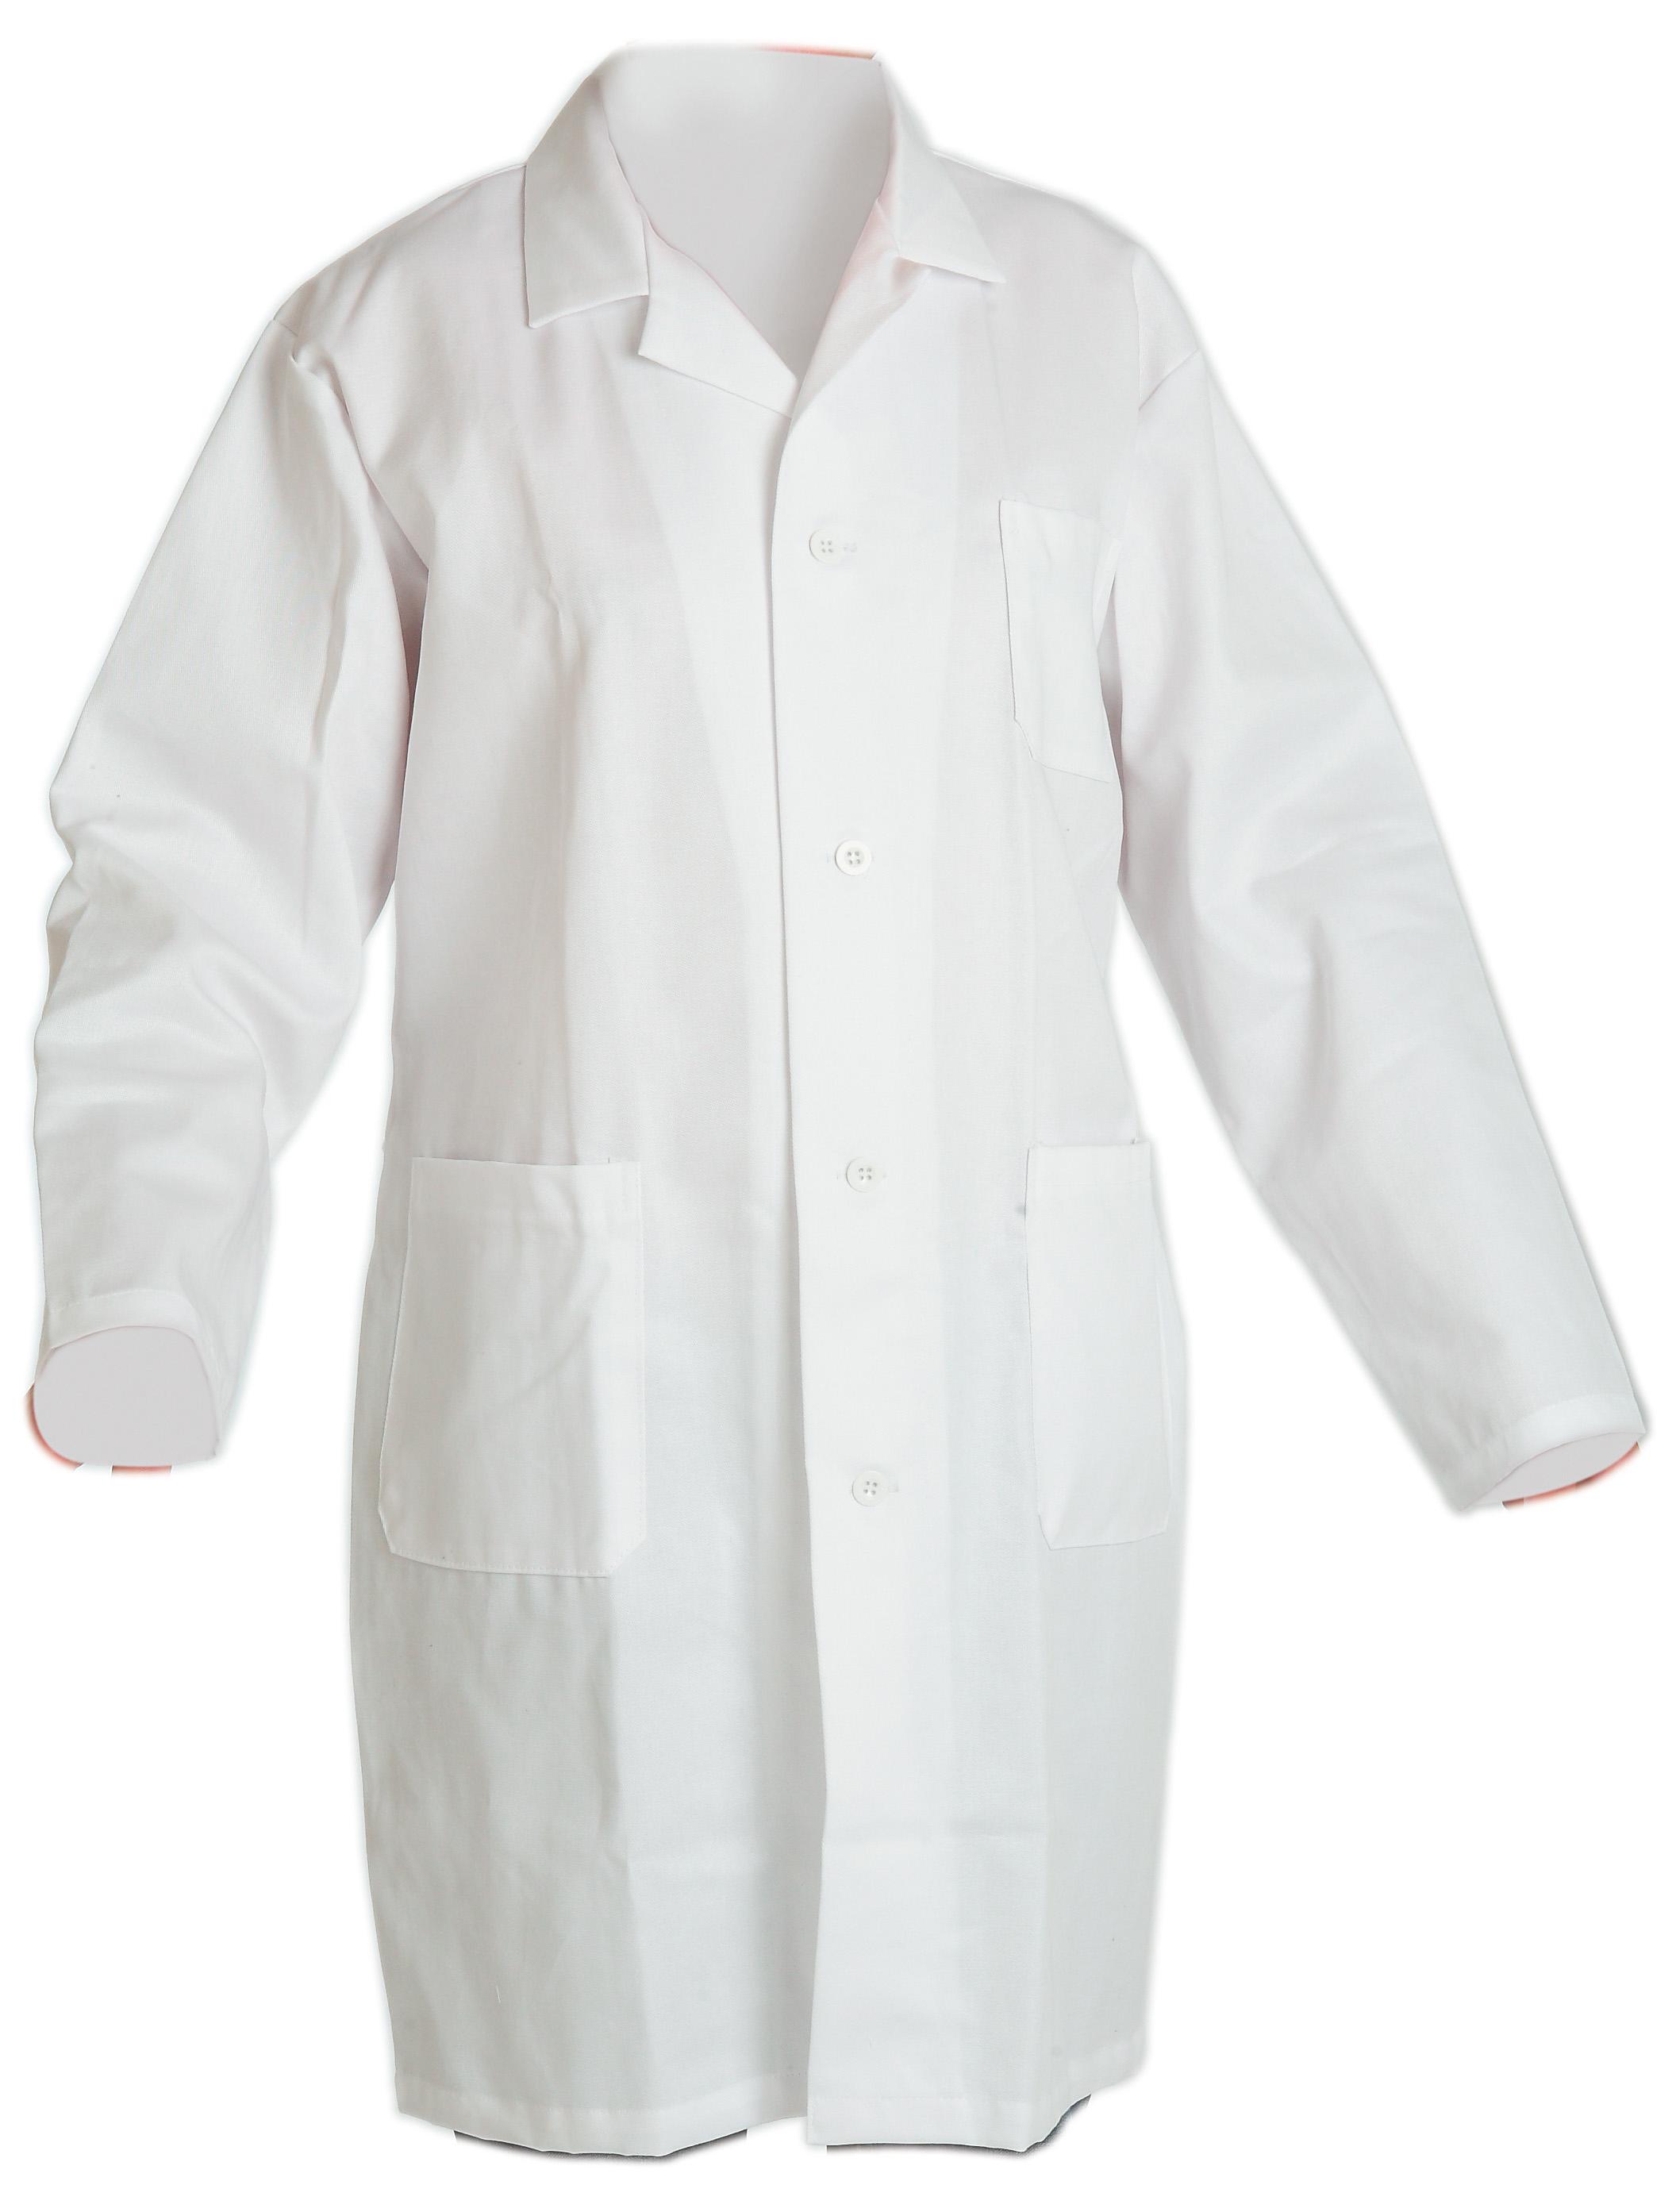 Orvosi Ruházat Medical Clothing  f9da699575